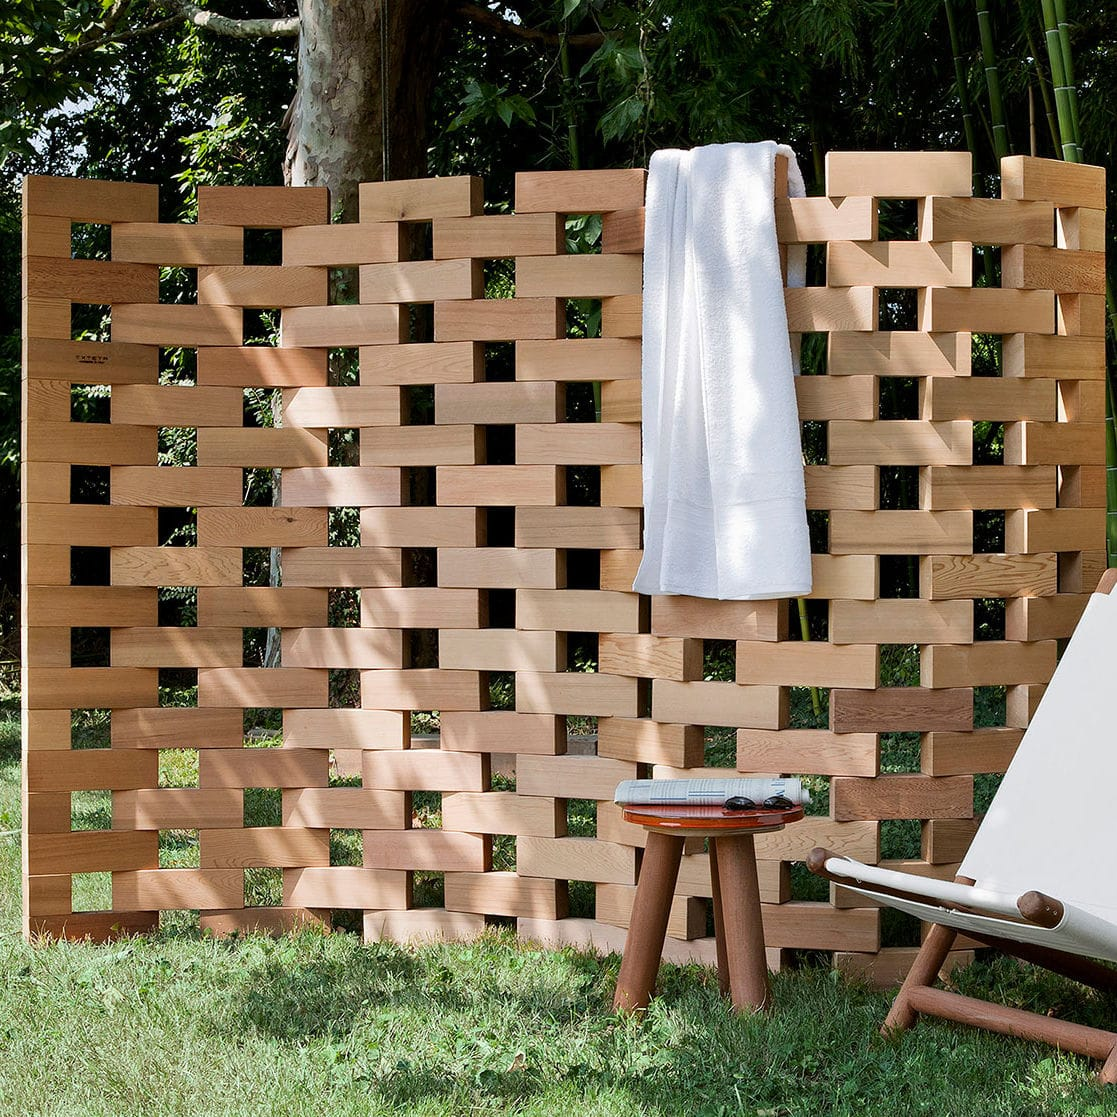 Paravento In Legno Per Esterni paravento moderno - zen - exteta - in legno / da giardino